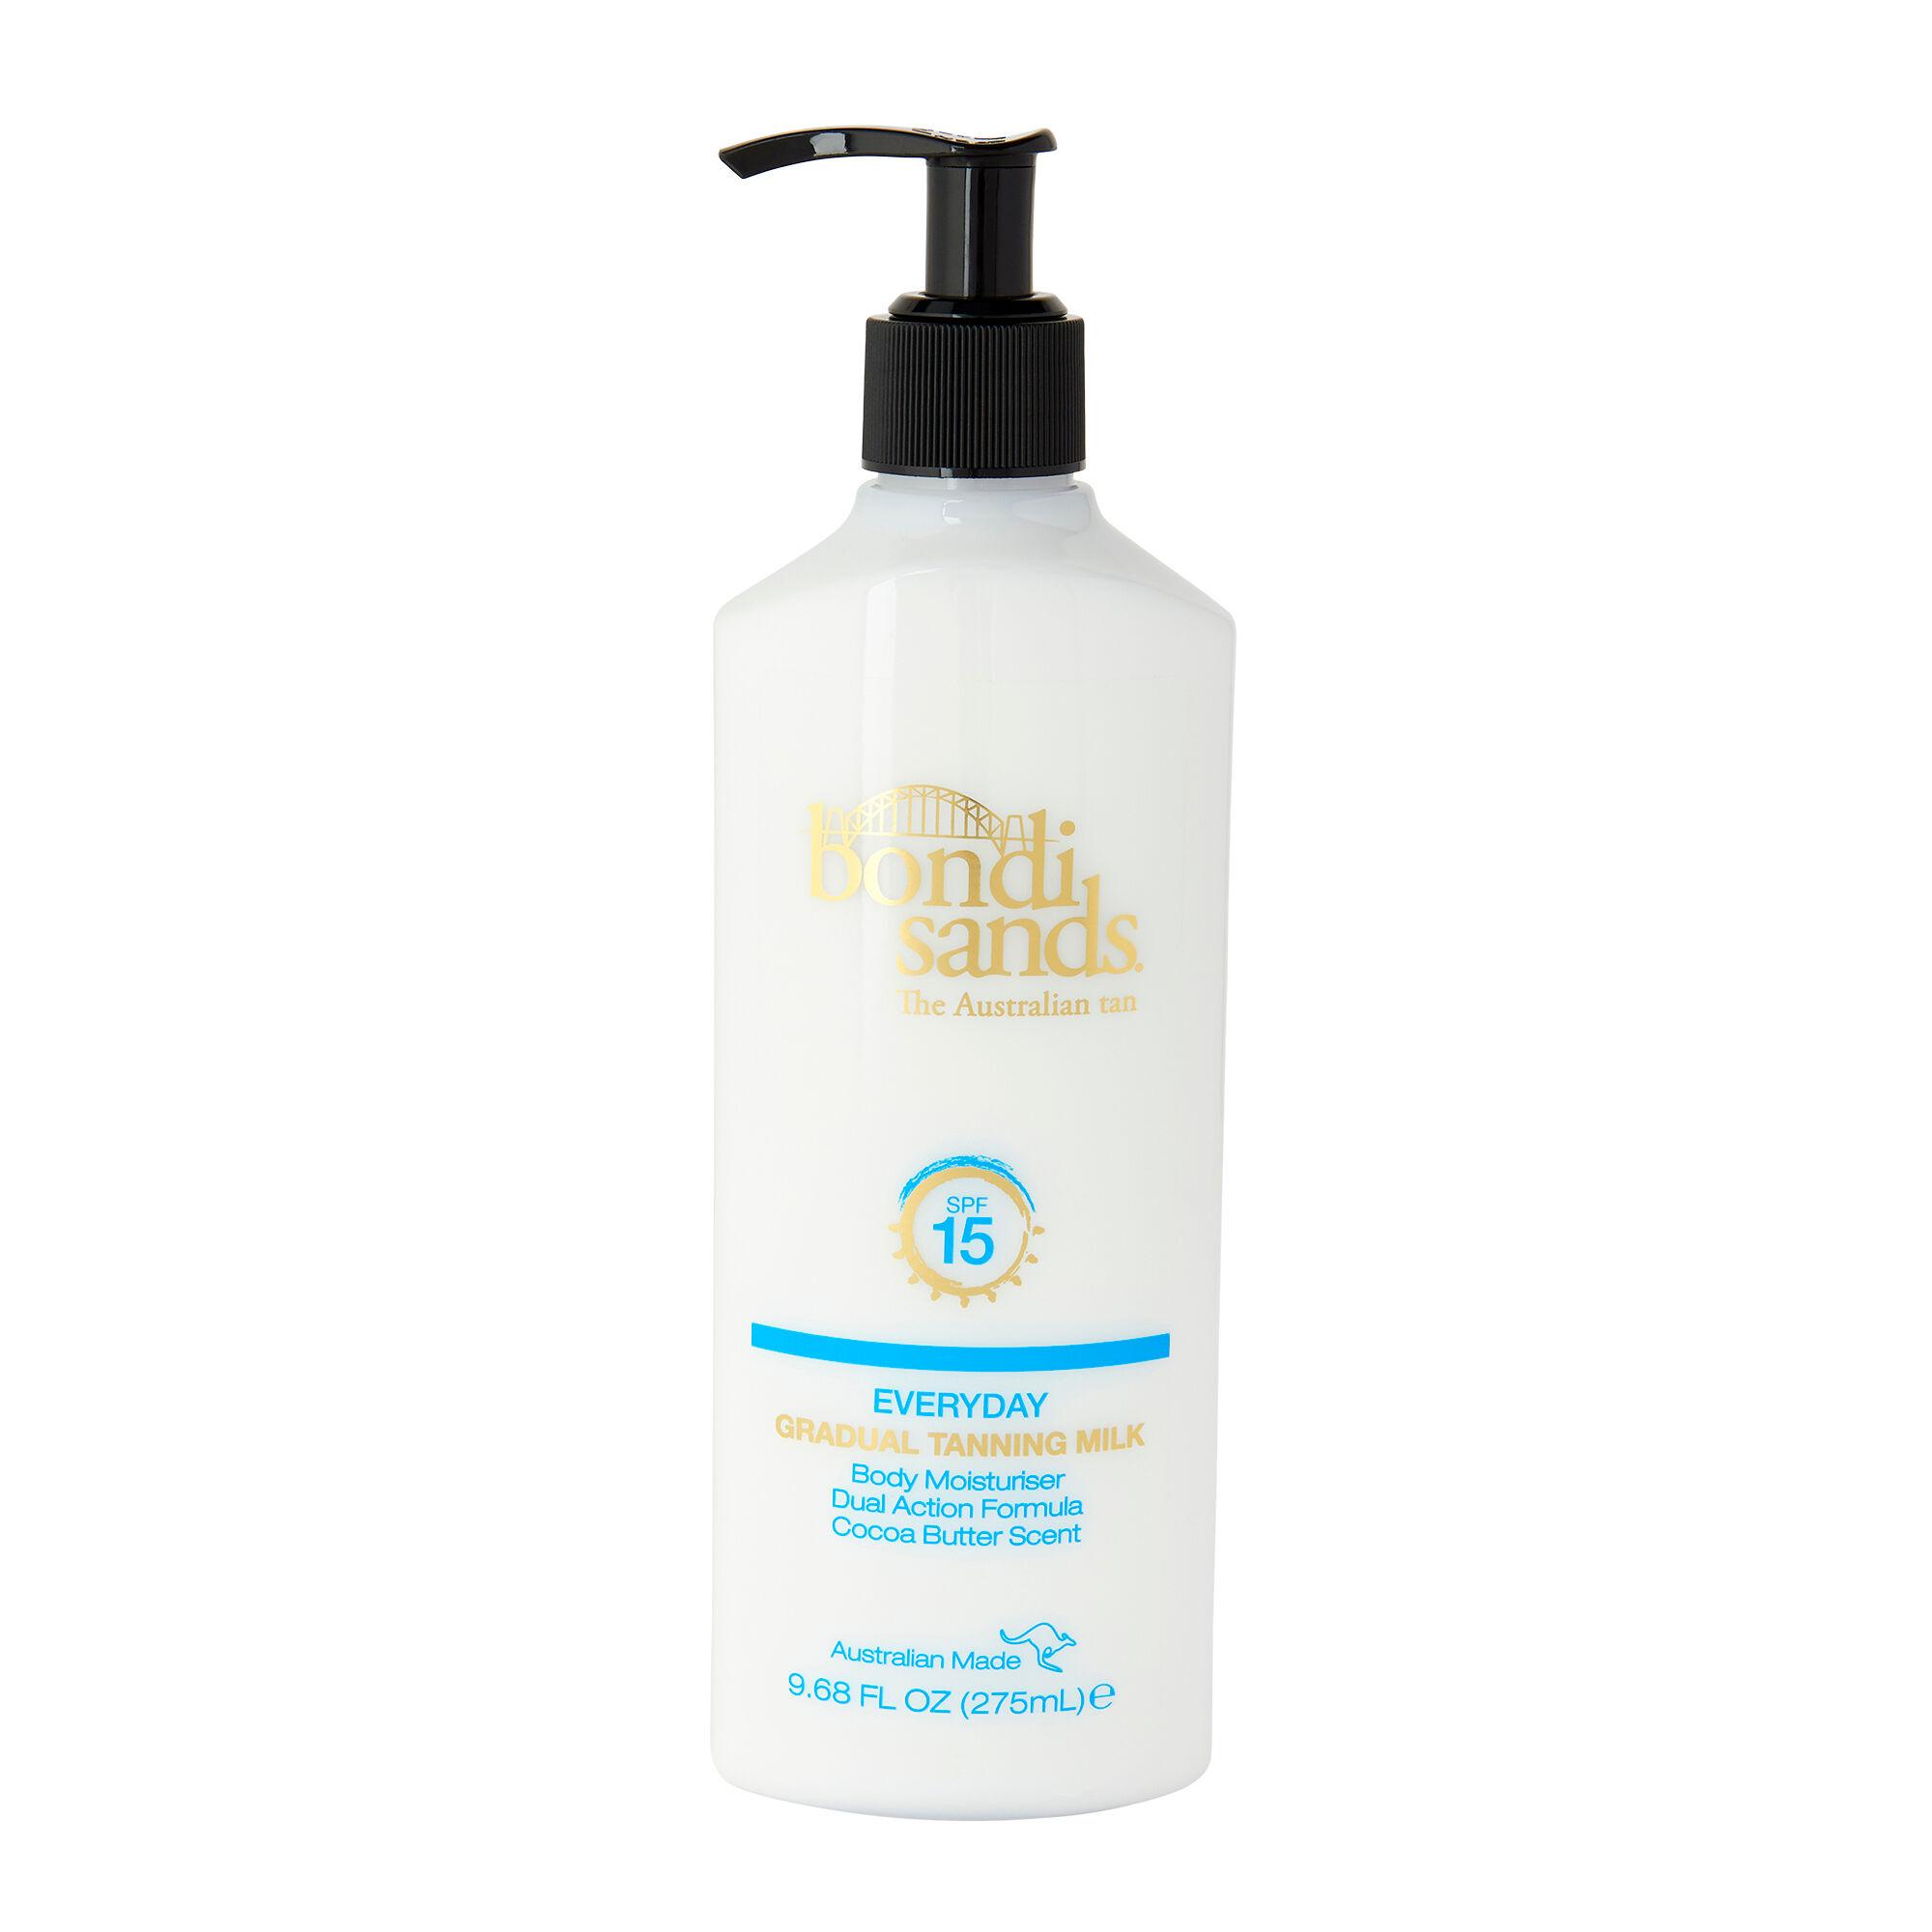 Bondi Sands Everyday Gradual Tanning Milk SPF 15 275ml